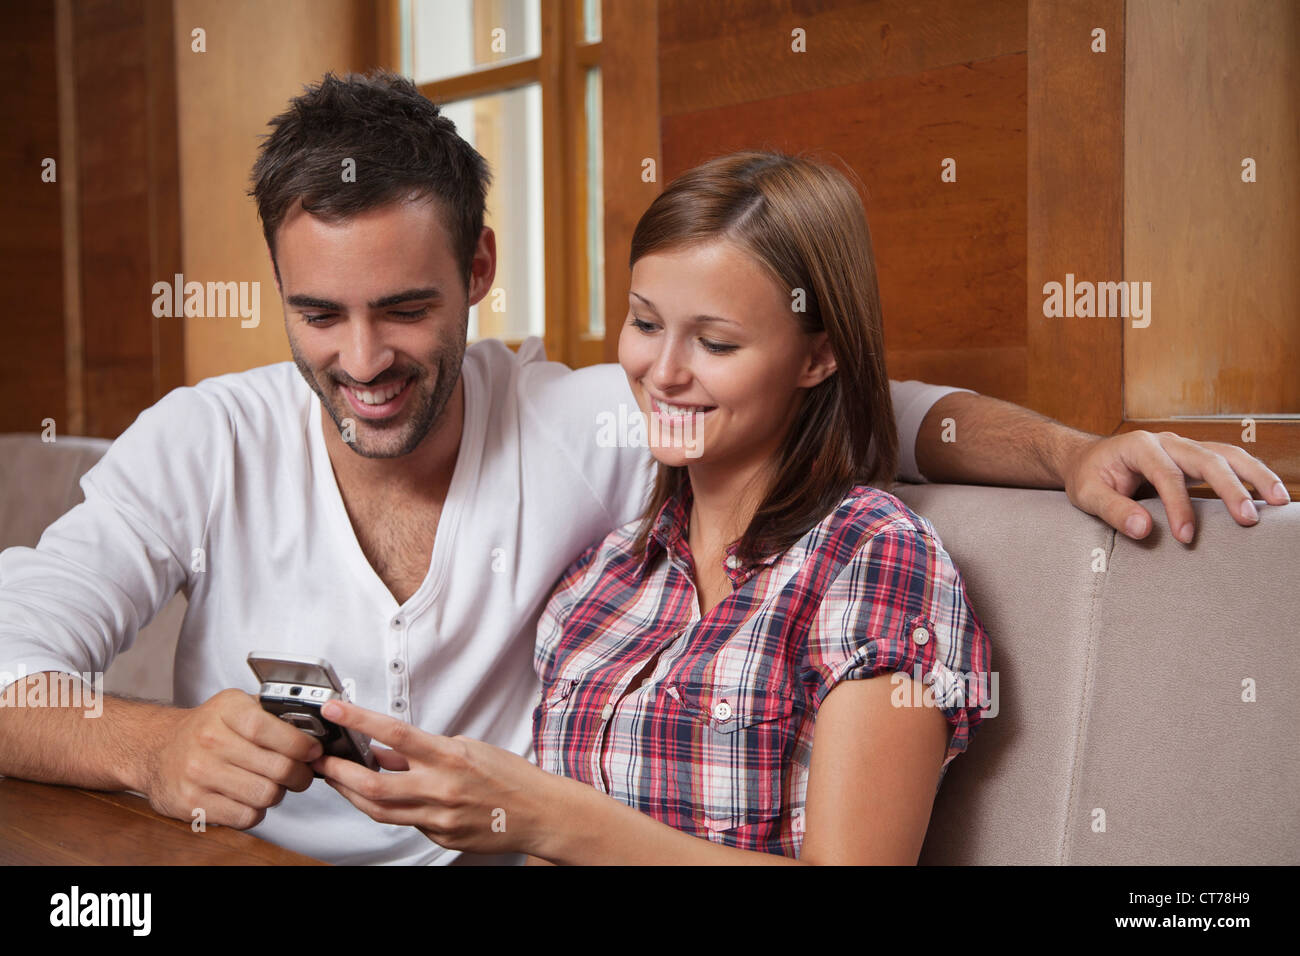 Pareja joven compartir mensaje de texto por teléfono móvil Imagen De Stock